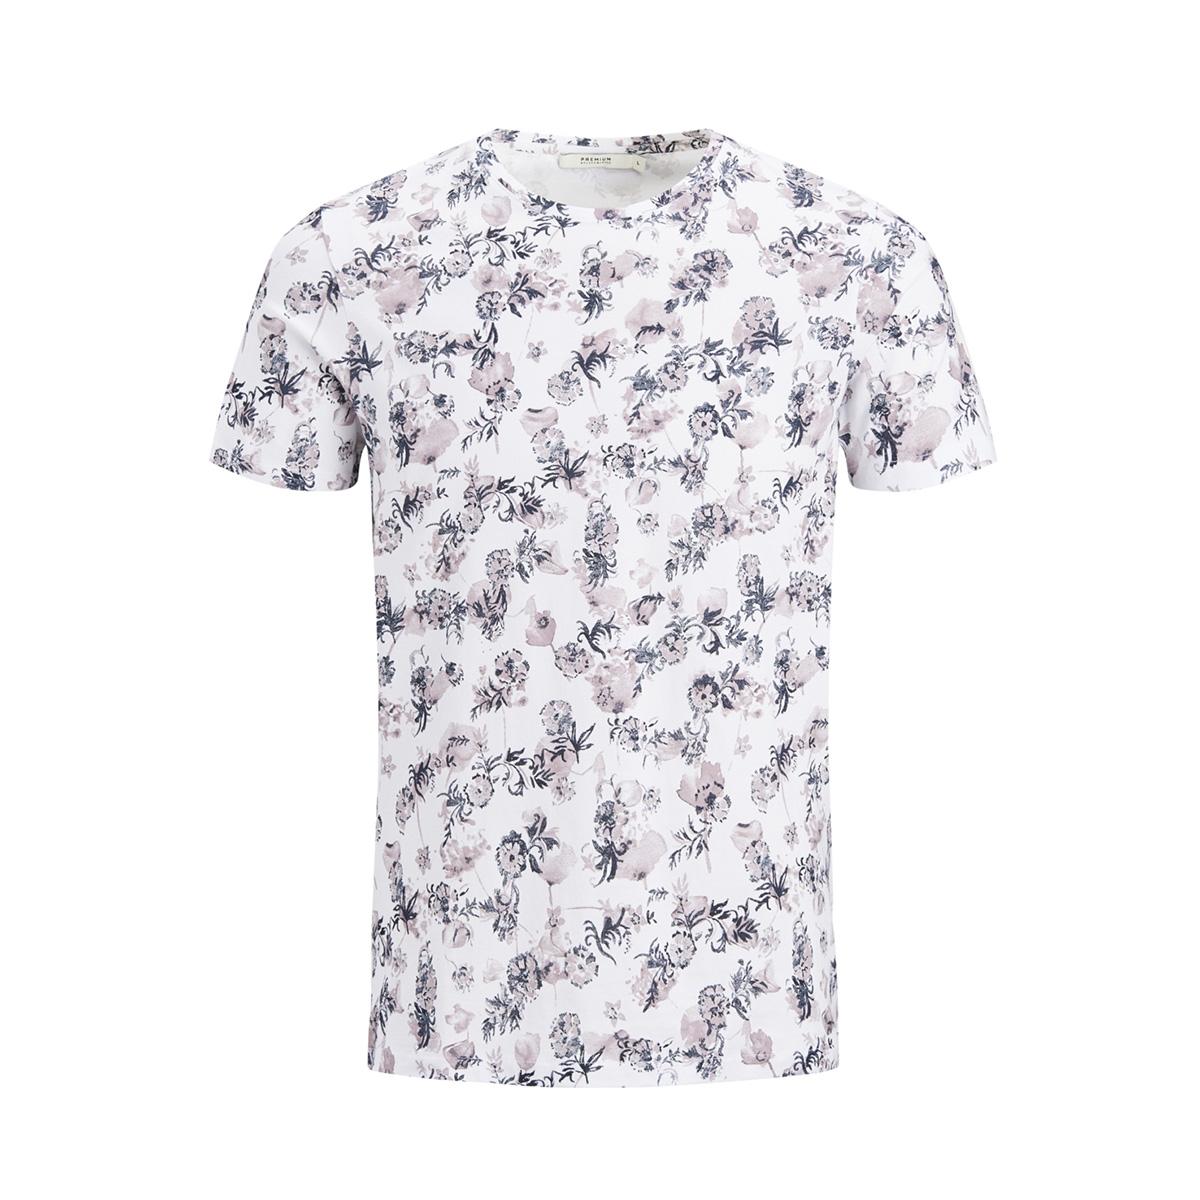 jprrussel tee ss crew neck 12135541 jack & jones t-shirt white/toadstool